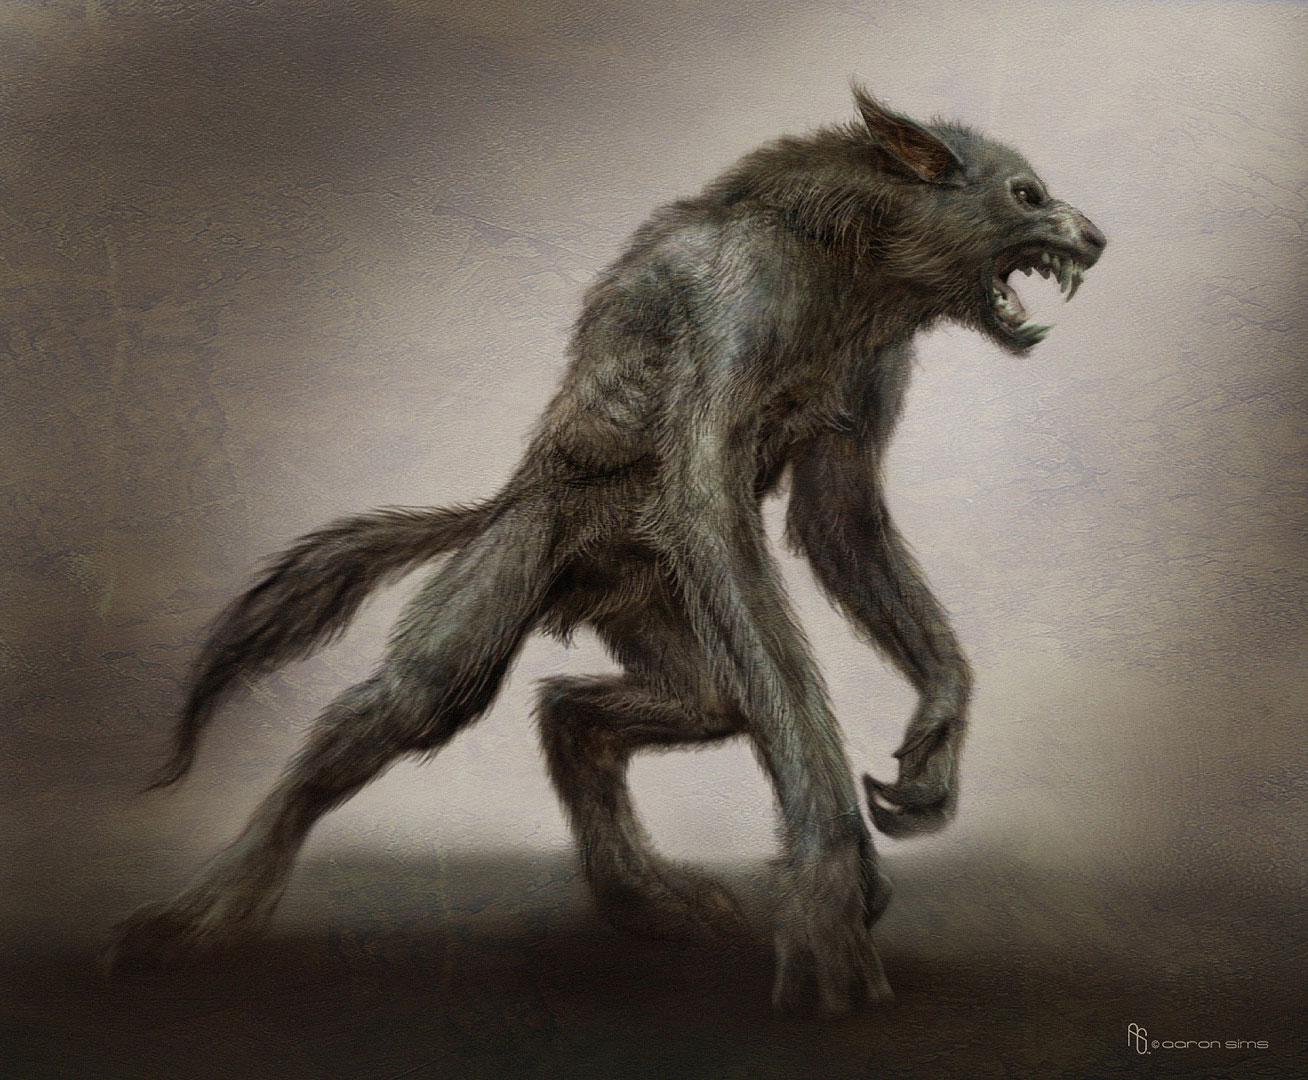 <img300*0:http://www.costaricantimes.com/wp-content/uploads/2014/08/werewolf-picture.jpg>